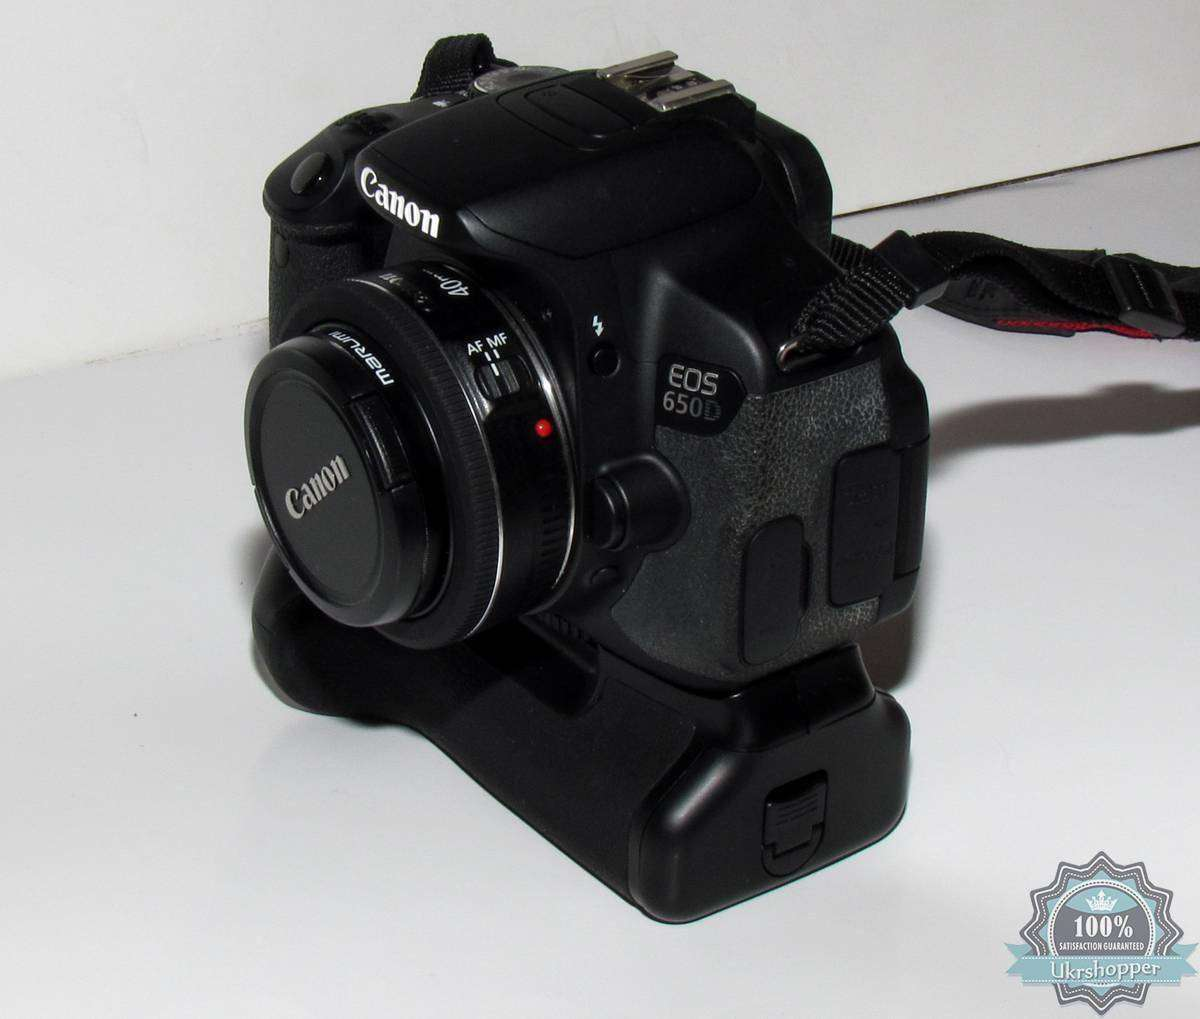 Сокол: Обзор миниатюрного объектива Canon EF 40mm f/2.8 STM